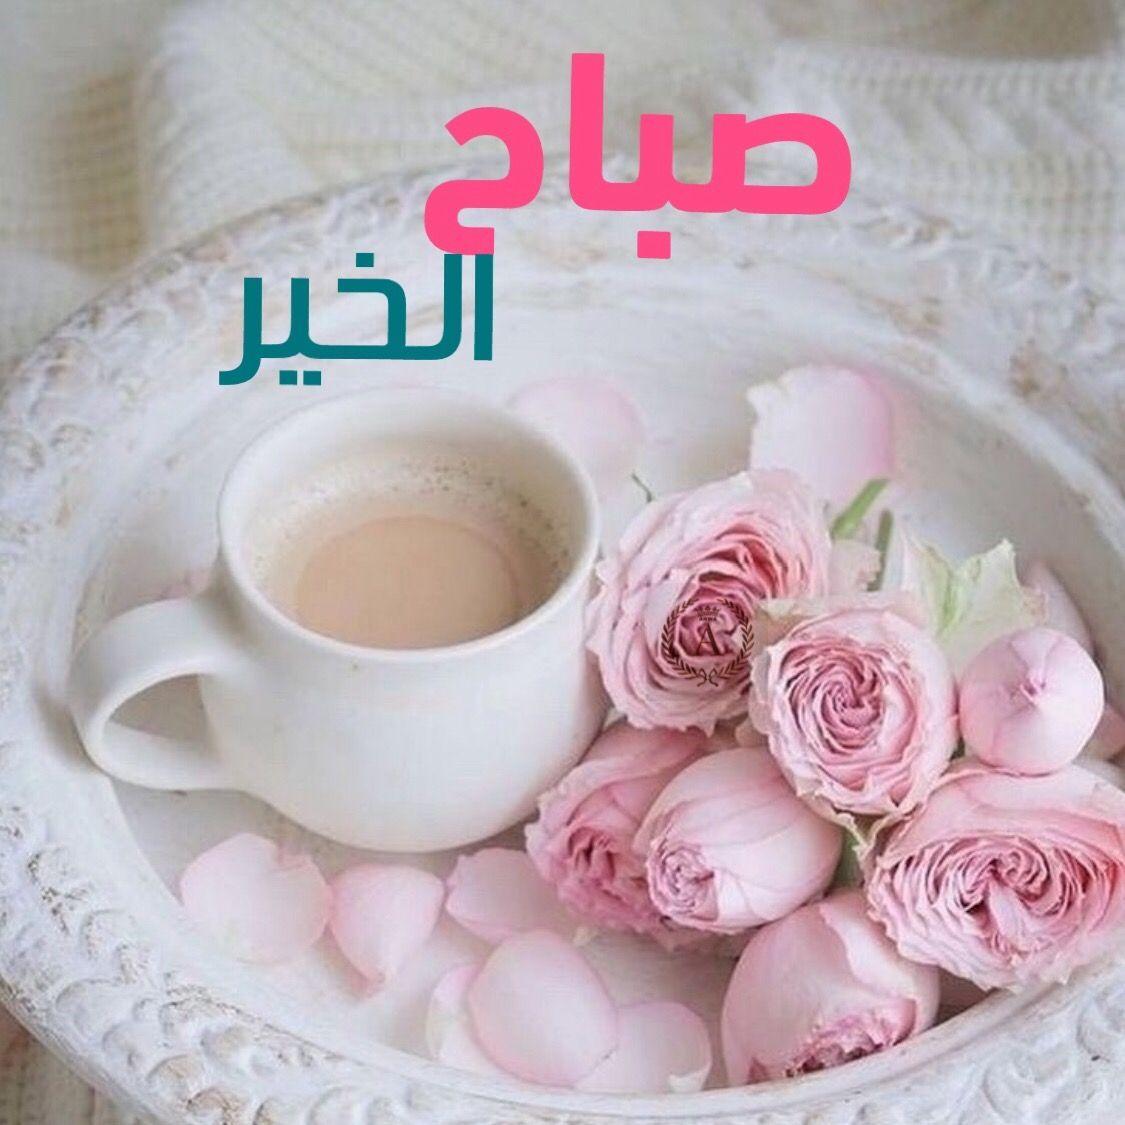 Pin By Rere On صباح الخير Islamic Birthday Wishes Good Morning Arabic Morning Love Quotes